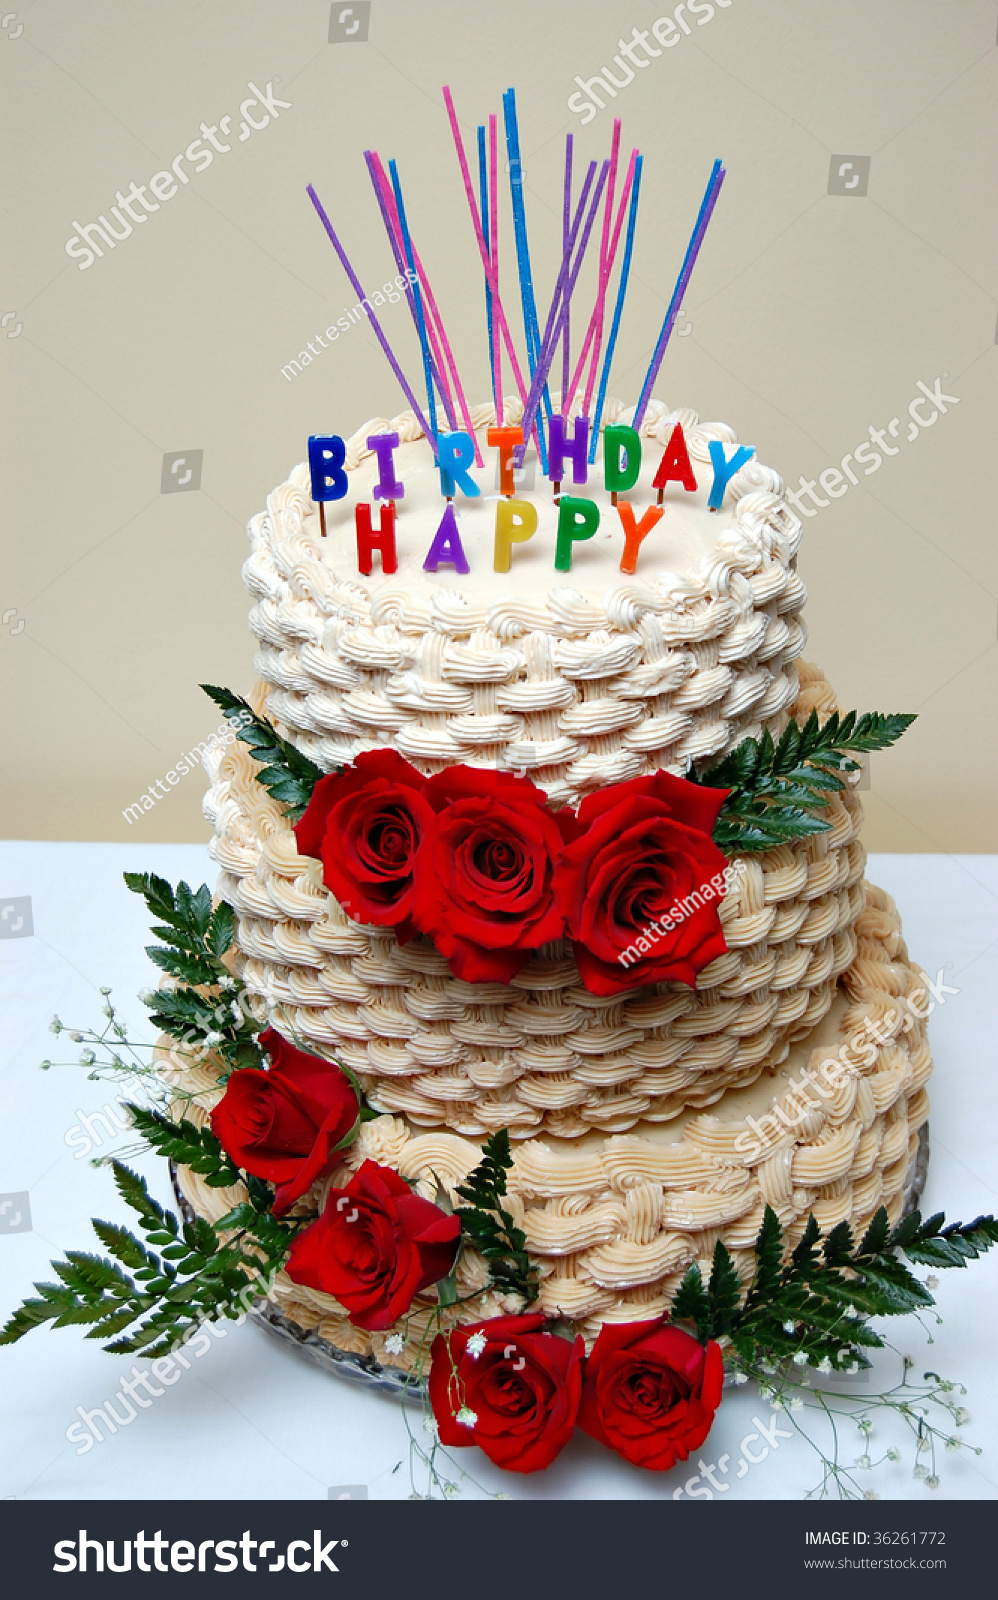 Birthday Cake Decorated Roses Stock Photo Royalty Free 36261772